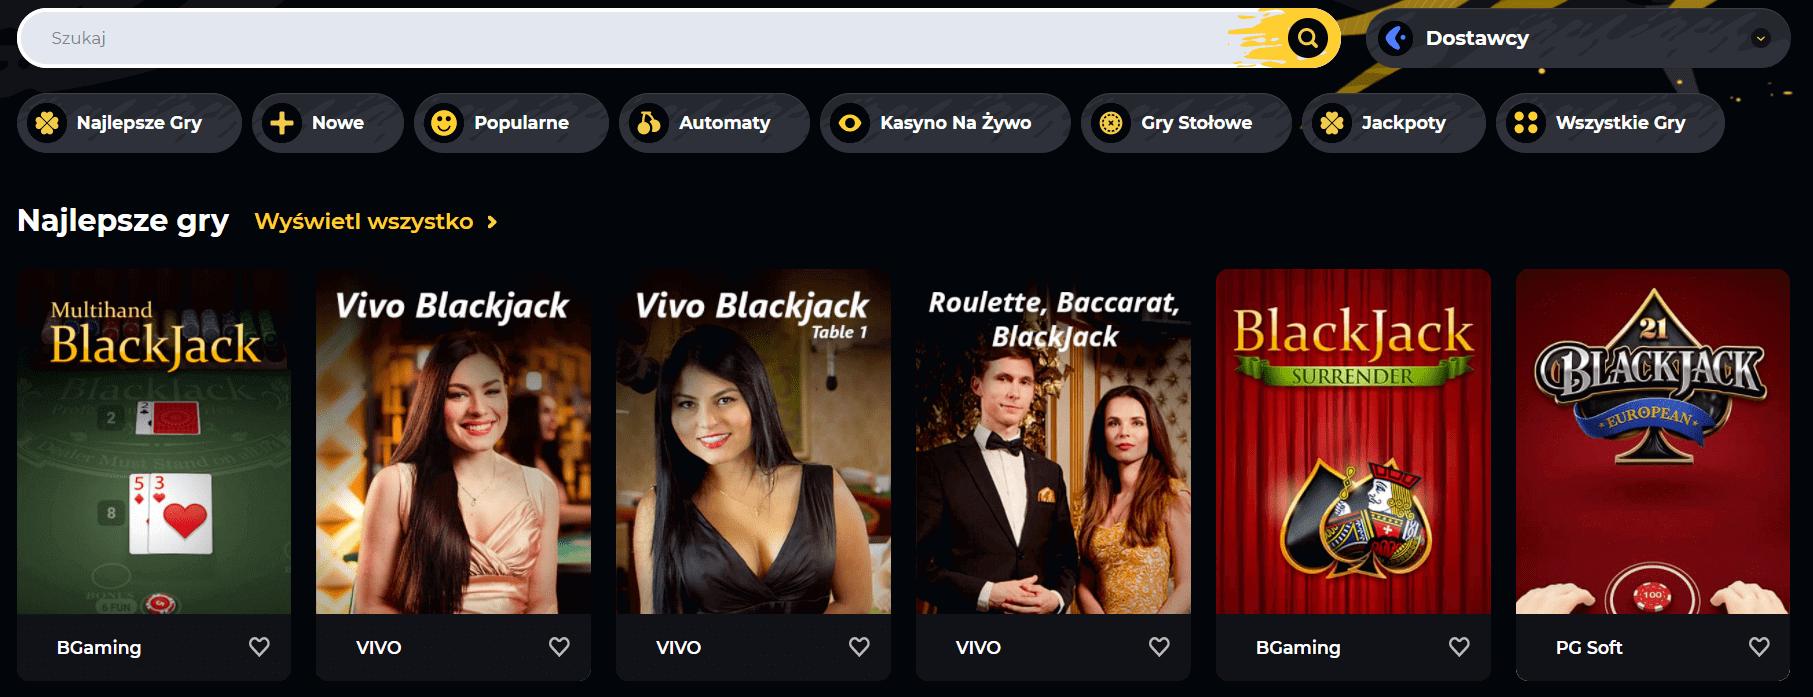 boomerang casino gry hazardowe screenshot